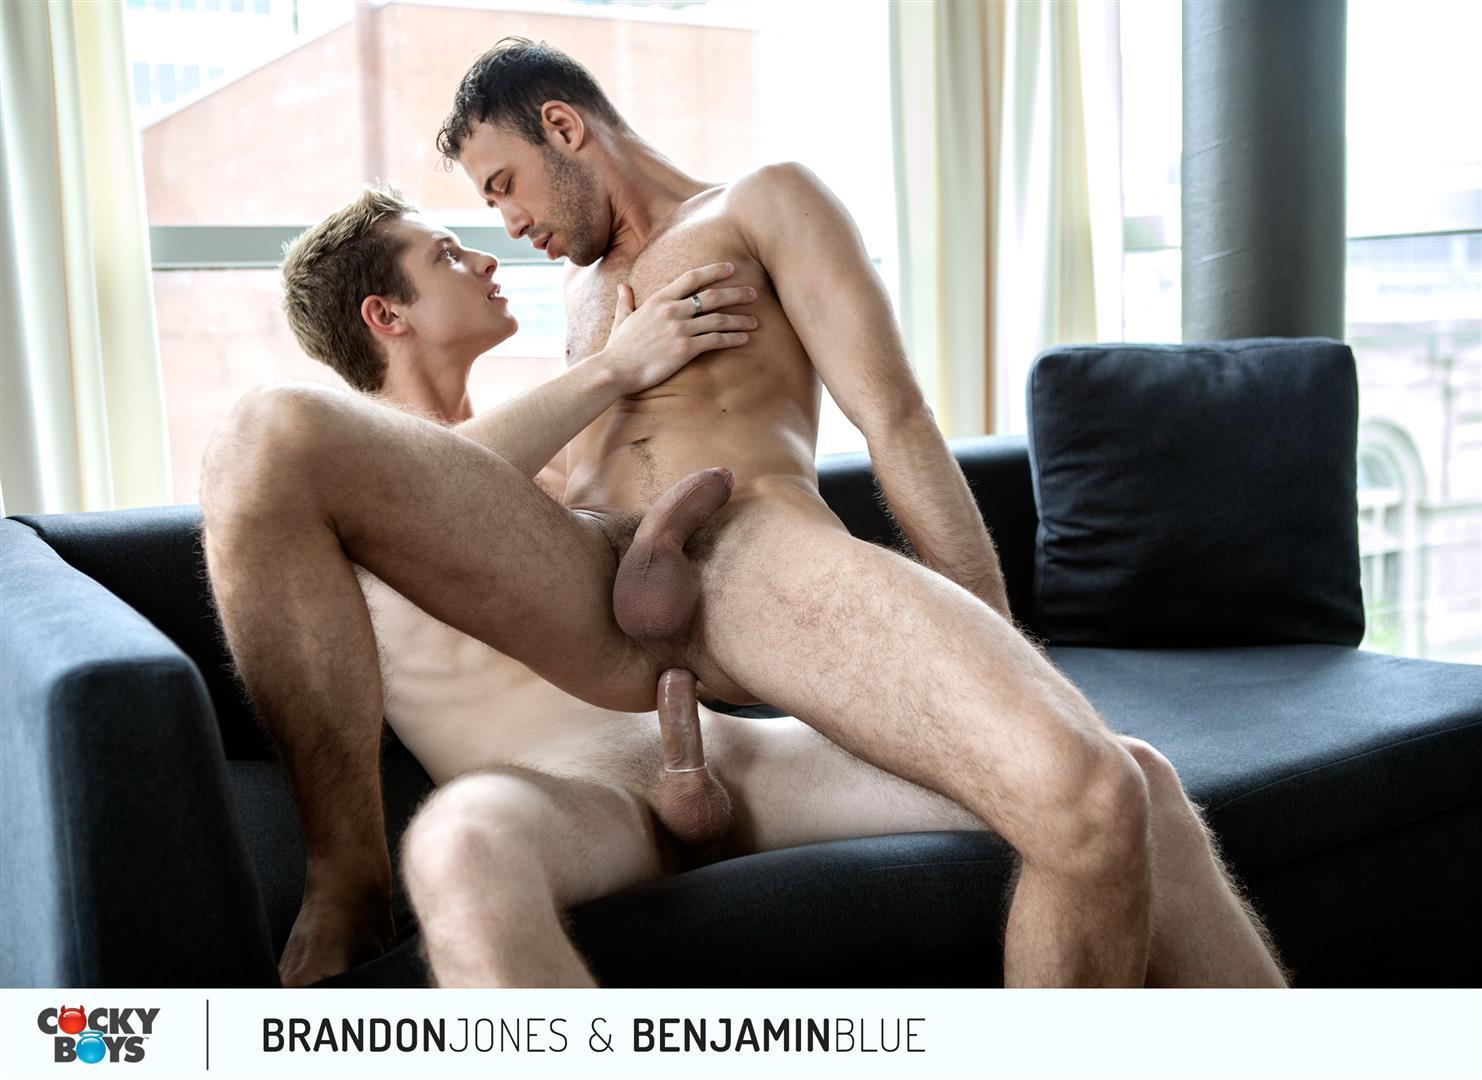 Cockyboys-Benjamin-Blue-and-Brandon-Jones-Flip-Flop-Fuck-Amateur-Gay-Porn-12 Cockyboys: Benjamin Blue Tops Brandon Jones For The First Time